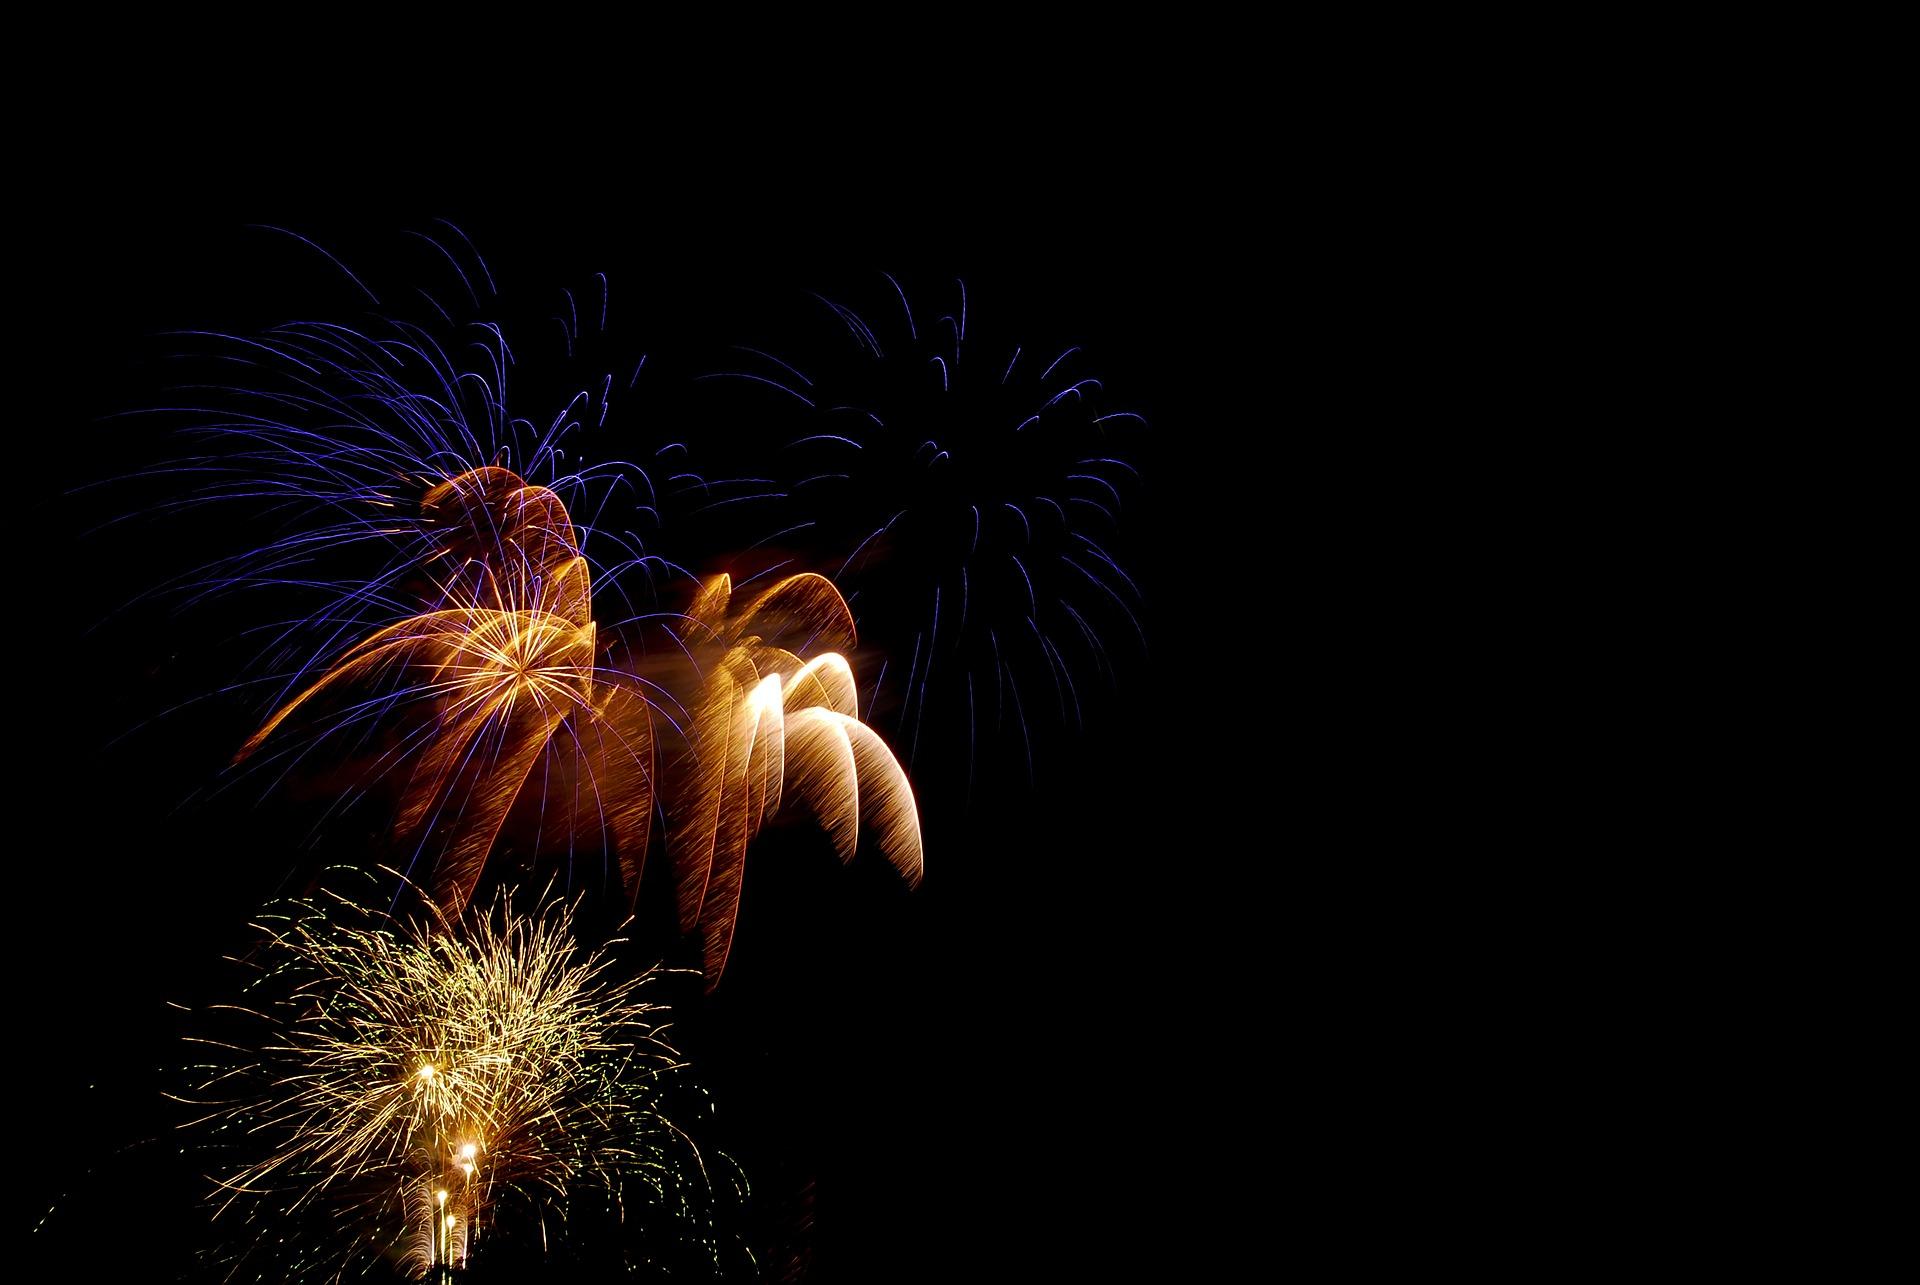 Fireworks against a black sky